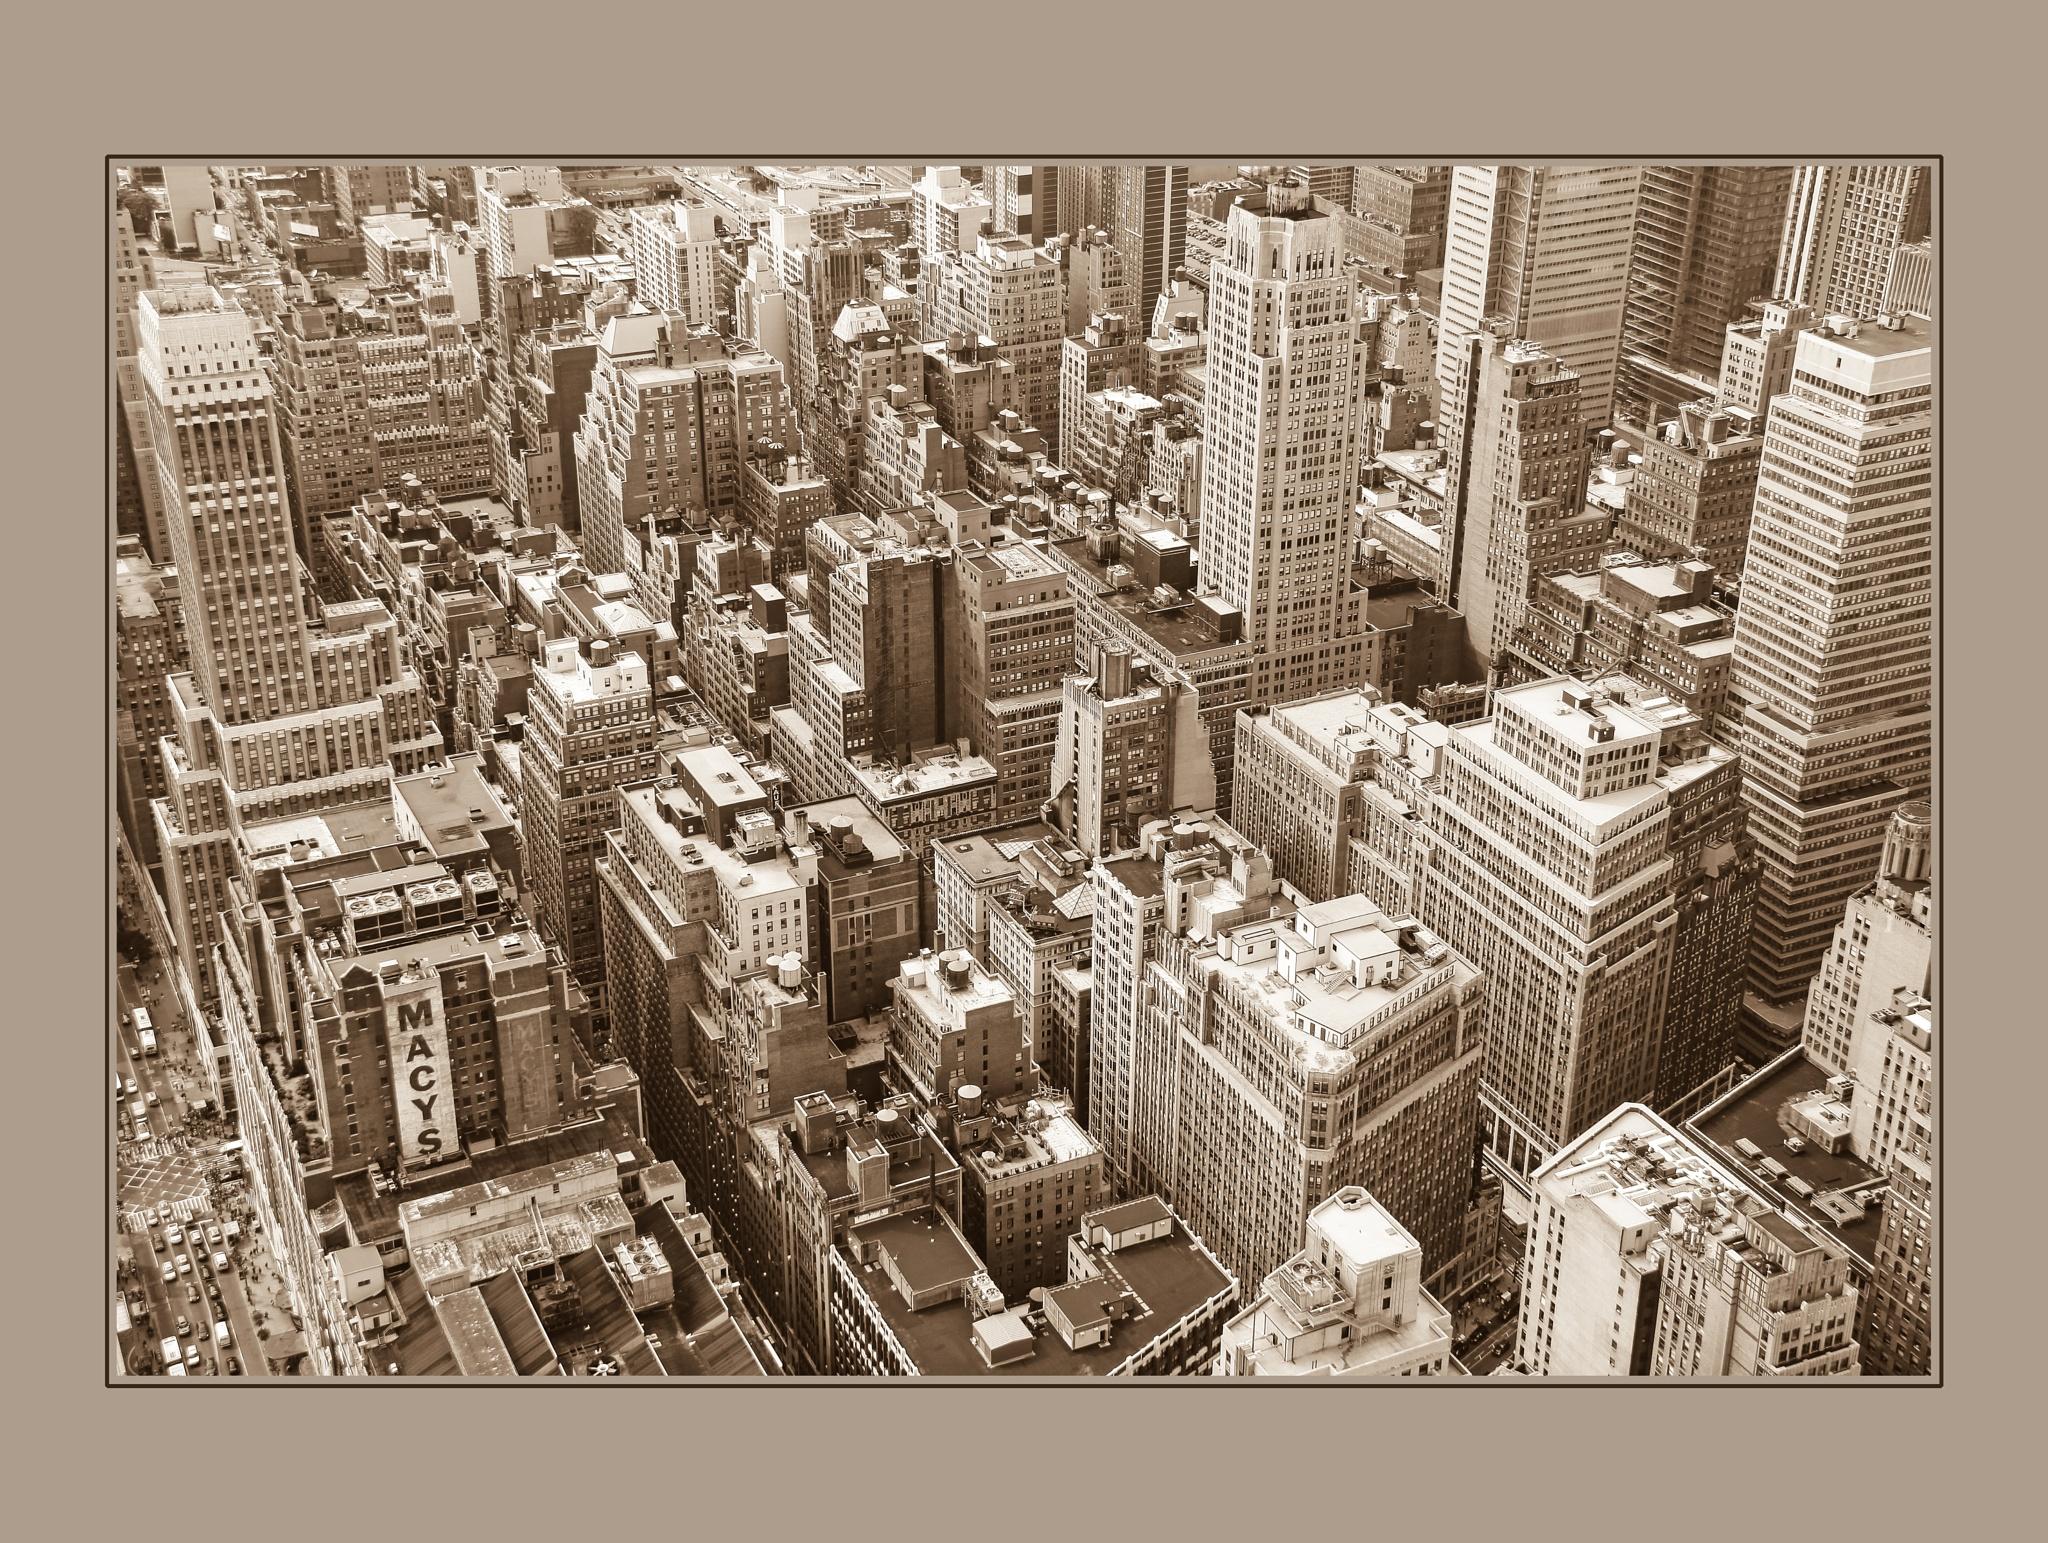 NY by Christoph Reiter